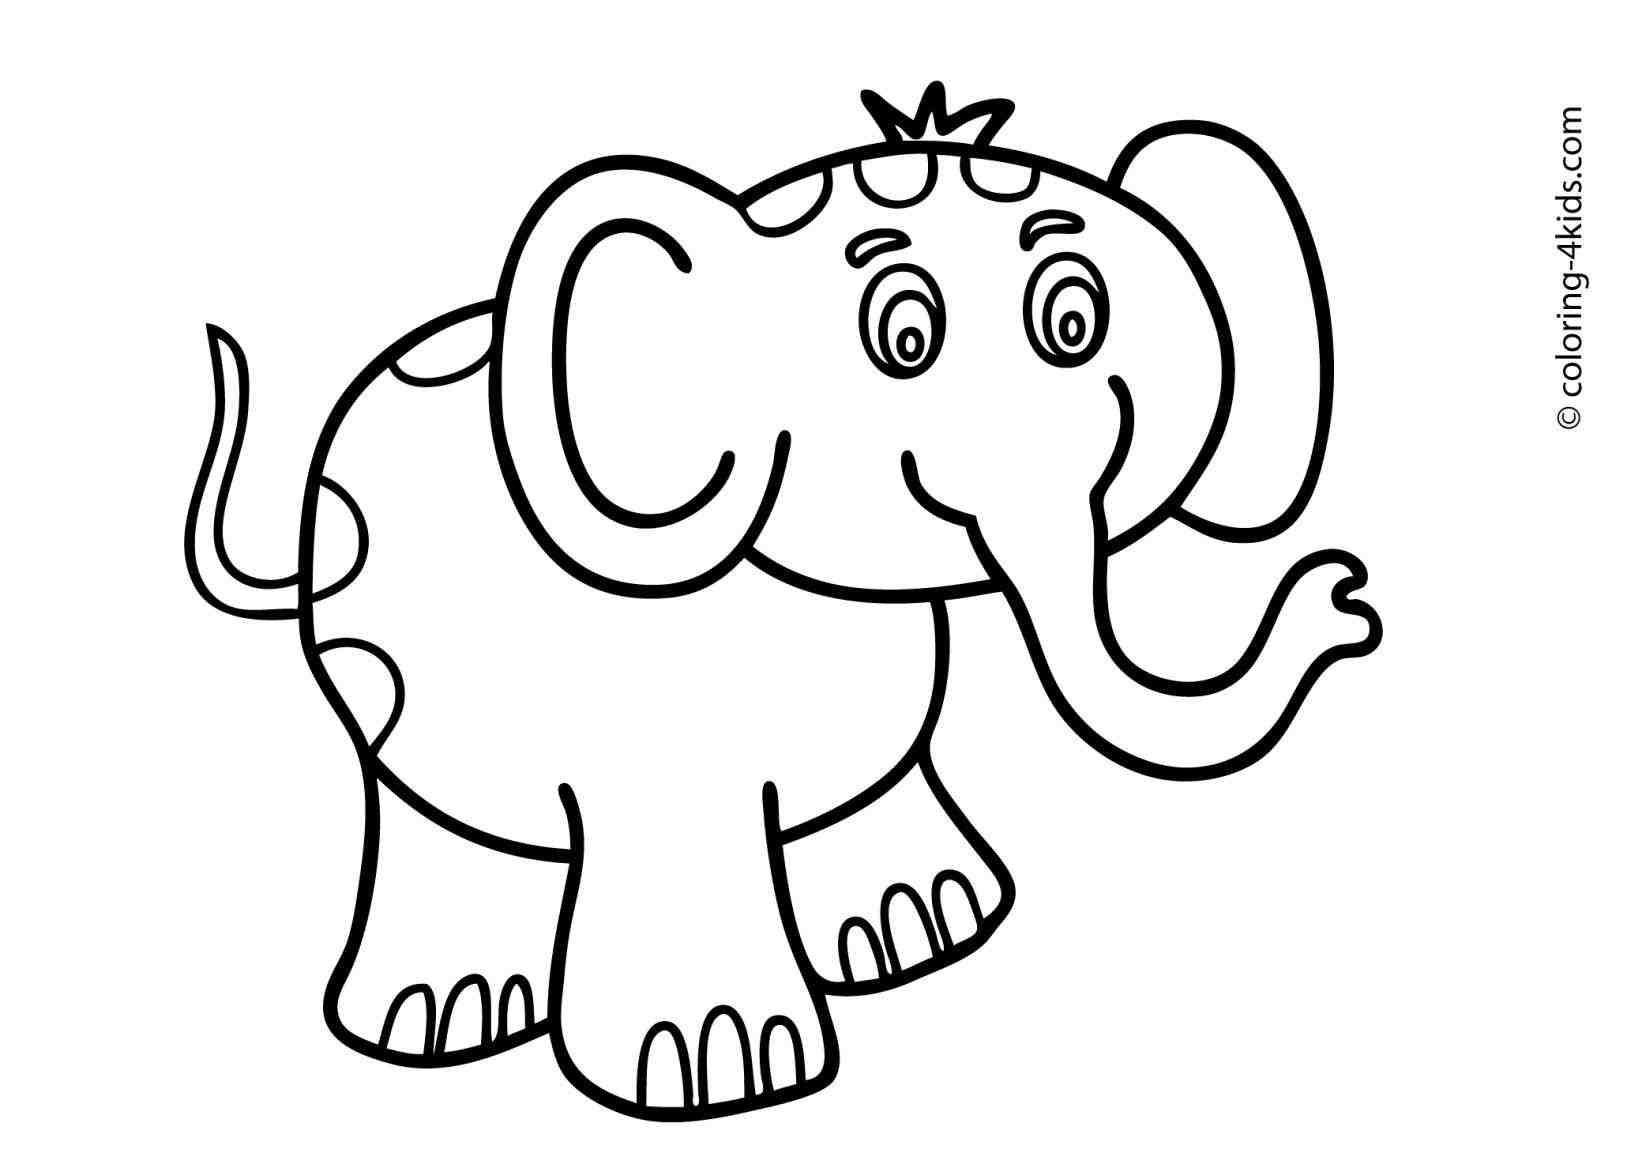 1642x1172 Kids Free Download Clip Art Cartoon Udemy Course Review Cartoon